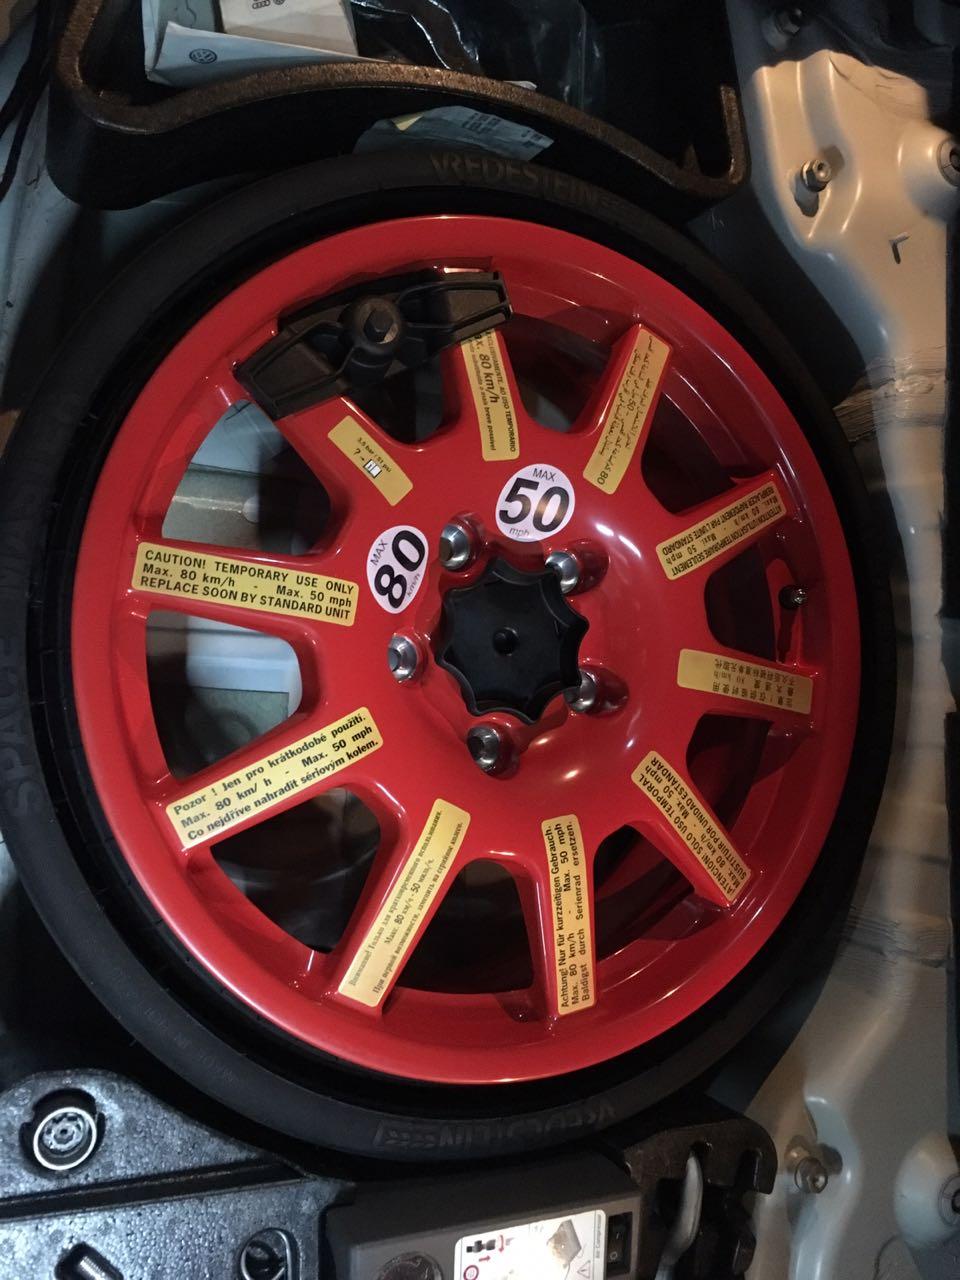 18 Inch Porsche Cayenne Original Collapsible E Saver Spare Wheel At Half Price R6500 Junk Mail